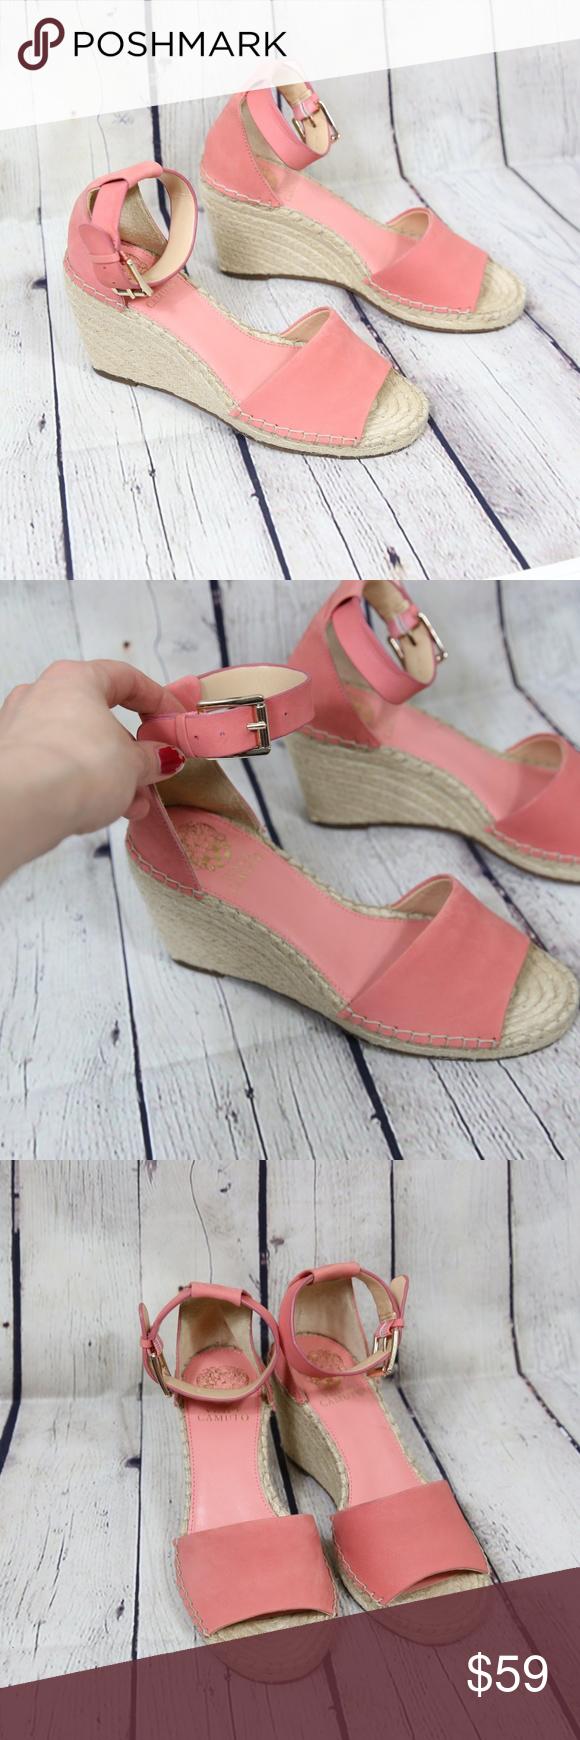 91b3da1d7a4 NEW Vince Camuto Leera Espadrille Wedge Sandals A sleek, ankle-strap ...